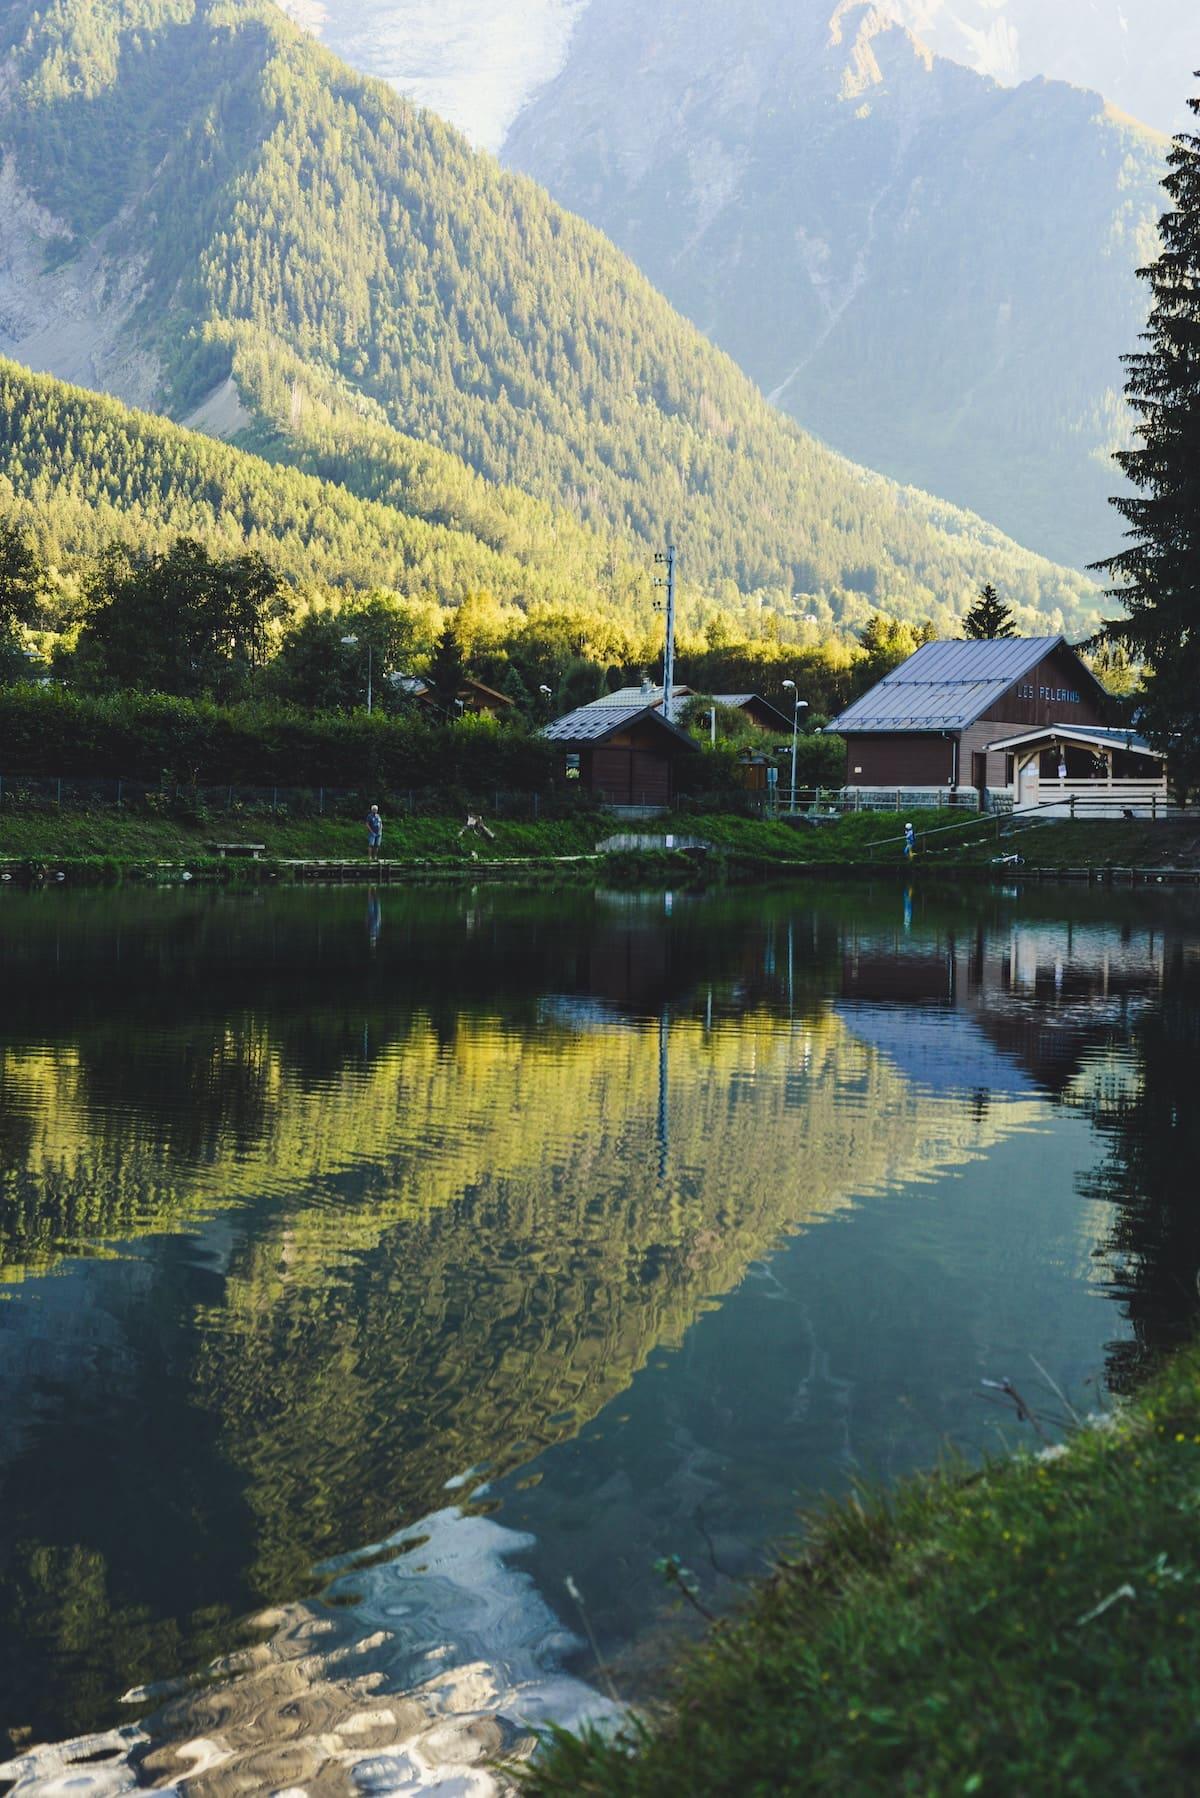 Inherited Property - Cottage or Cabin